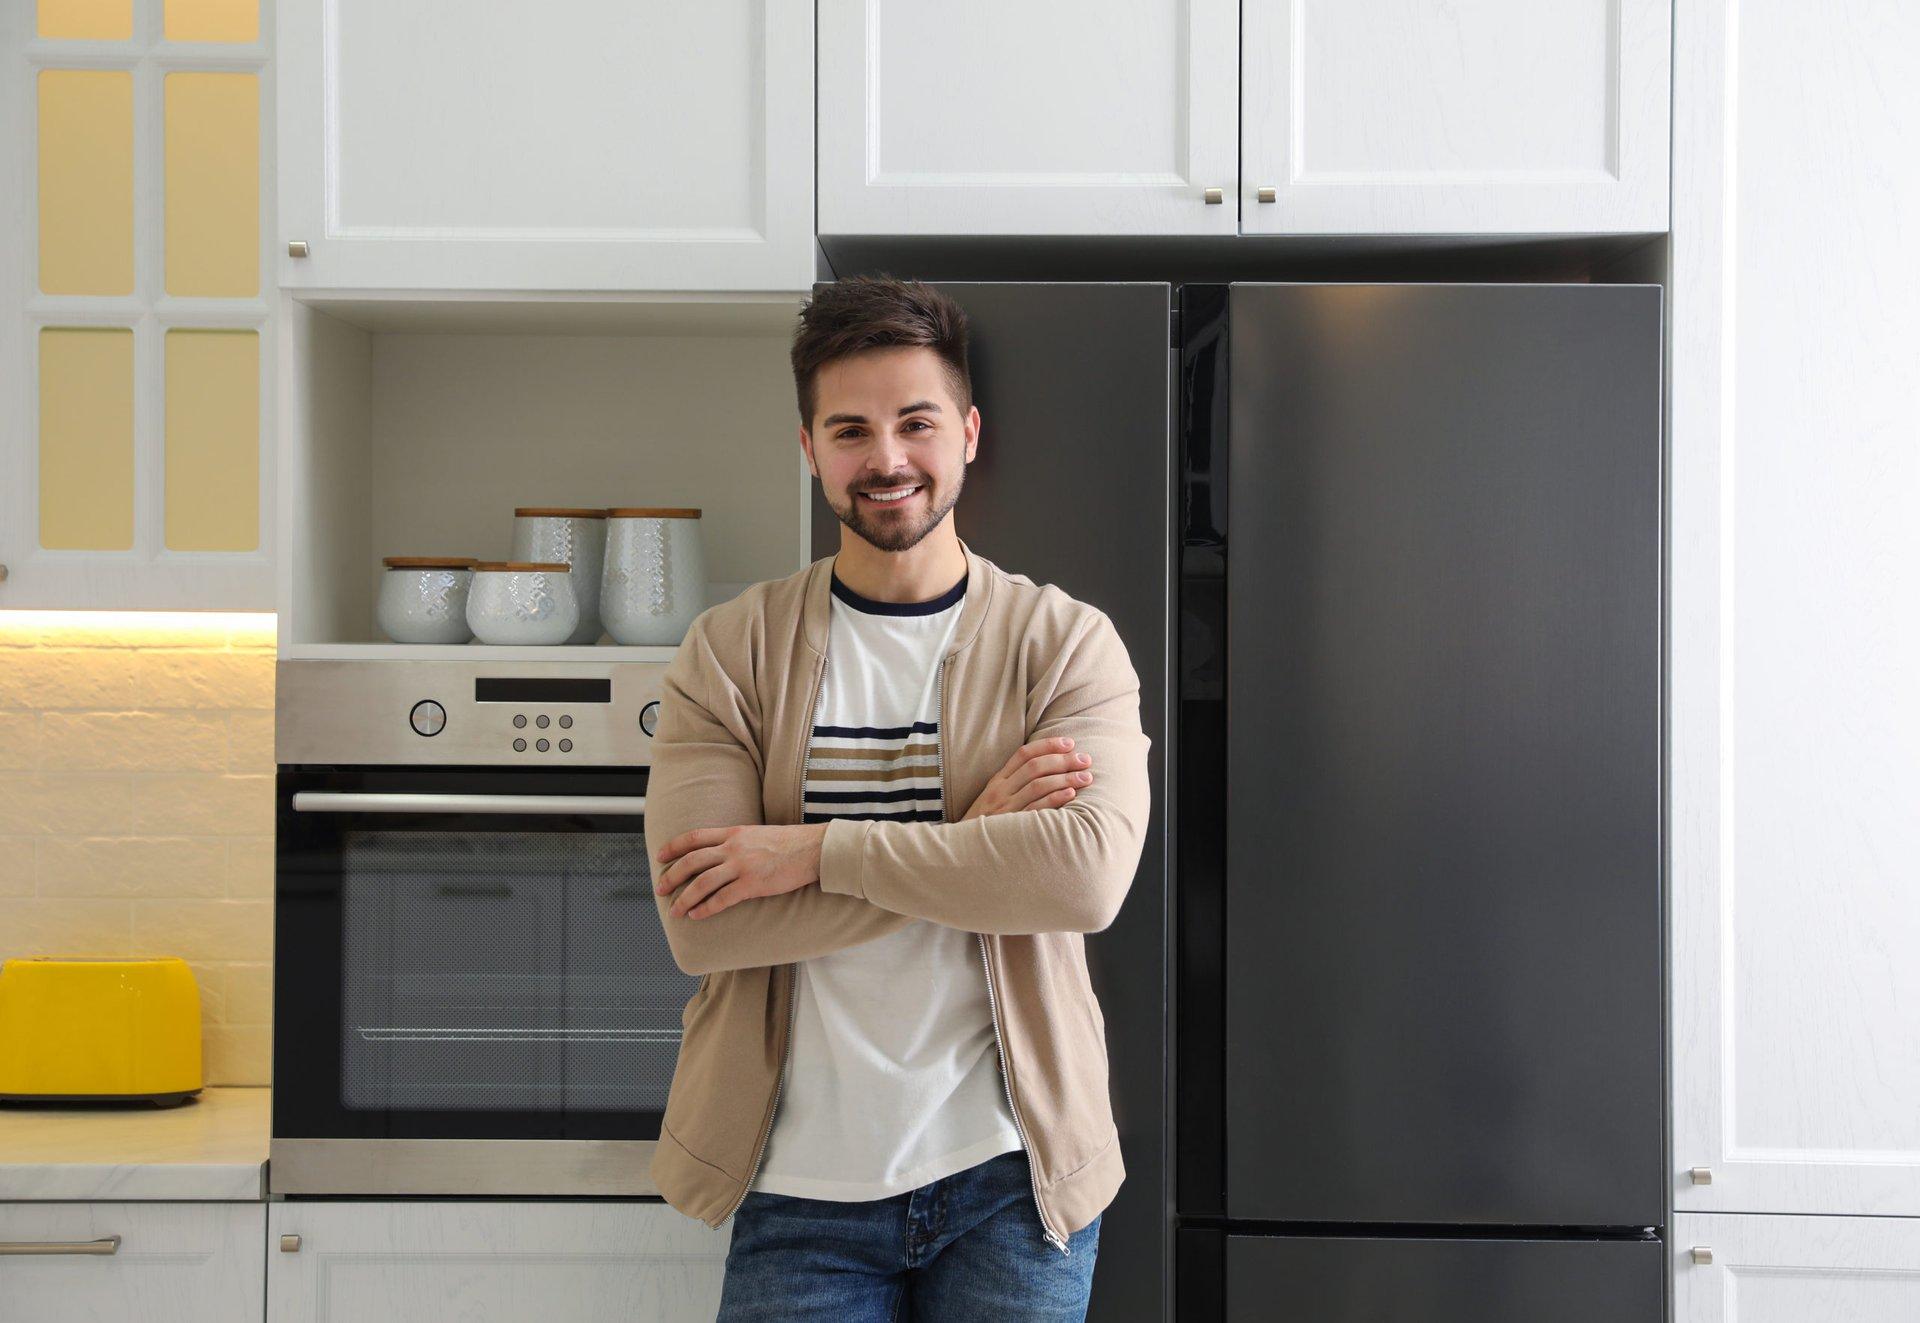 happy man with refrigerator